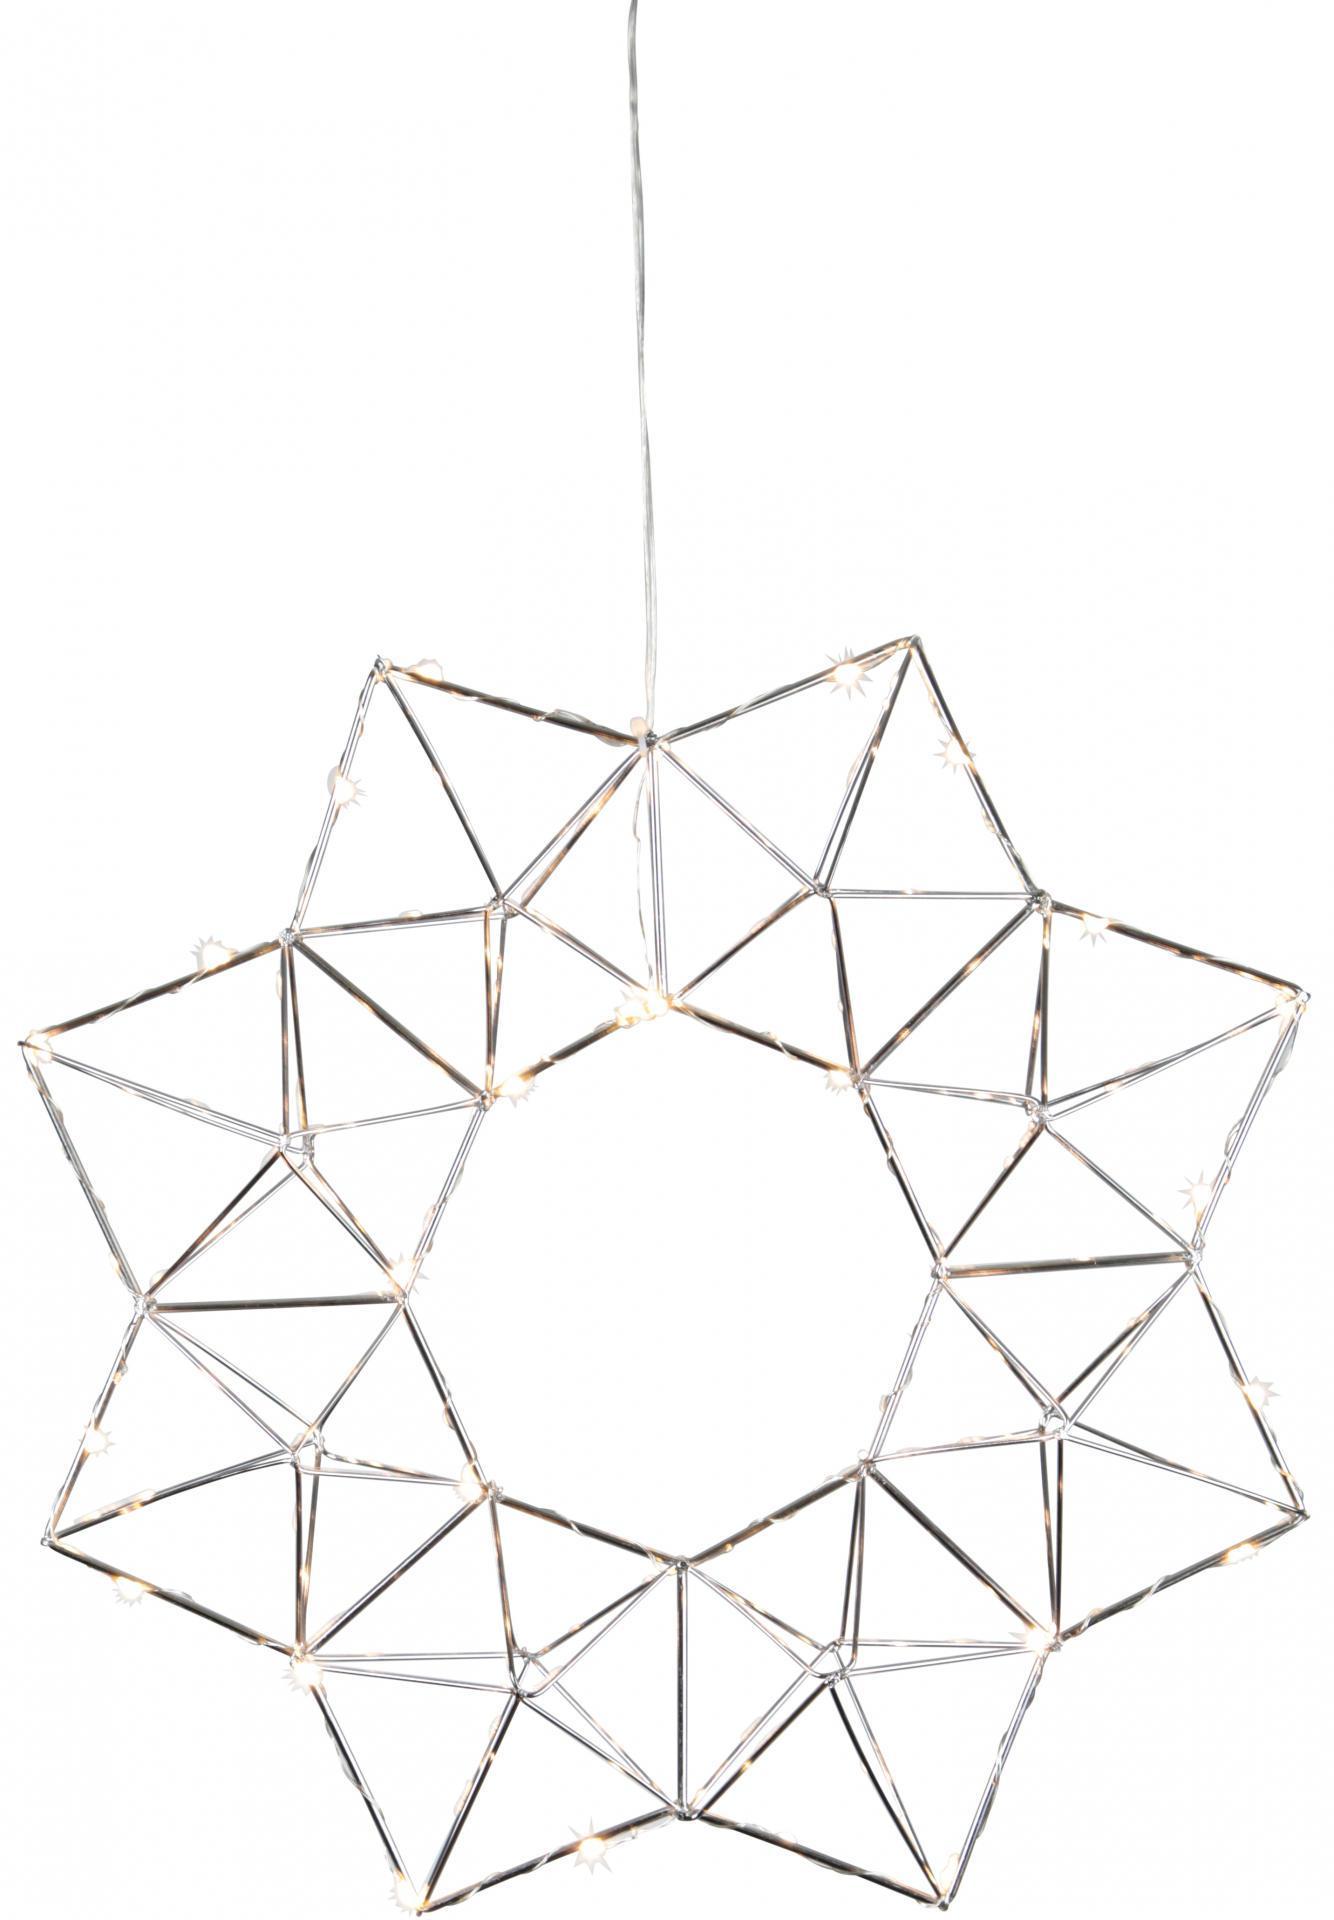 STAR TRADING Kovový svítící věnec Geometry Chrome, stříbrná barva, kov